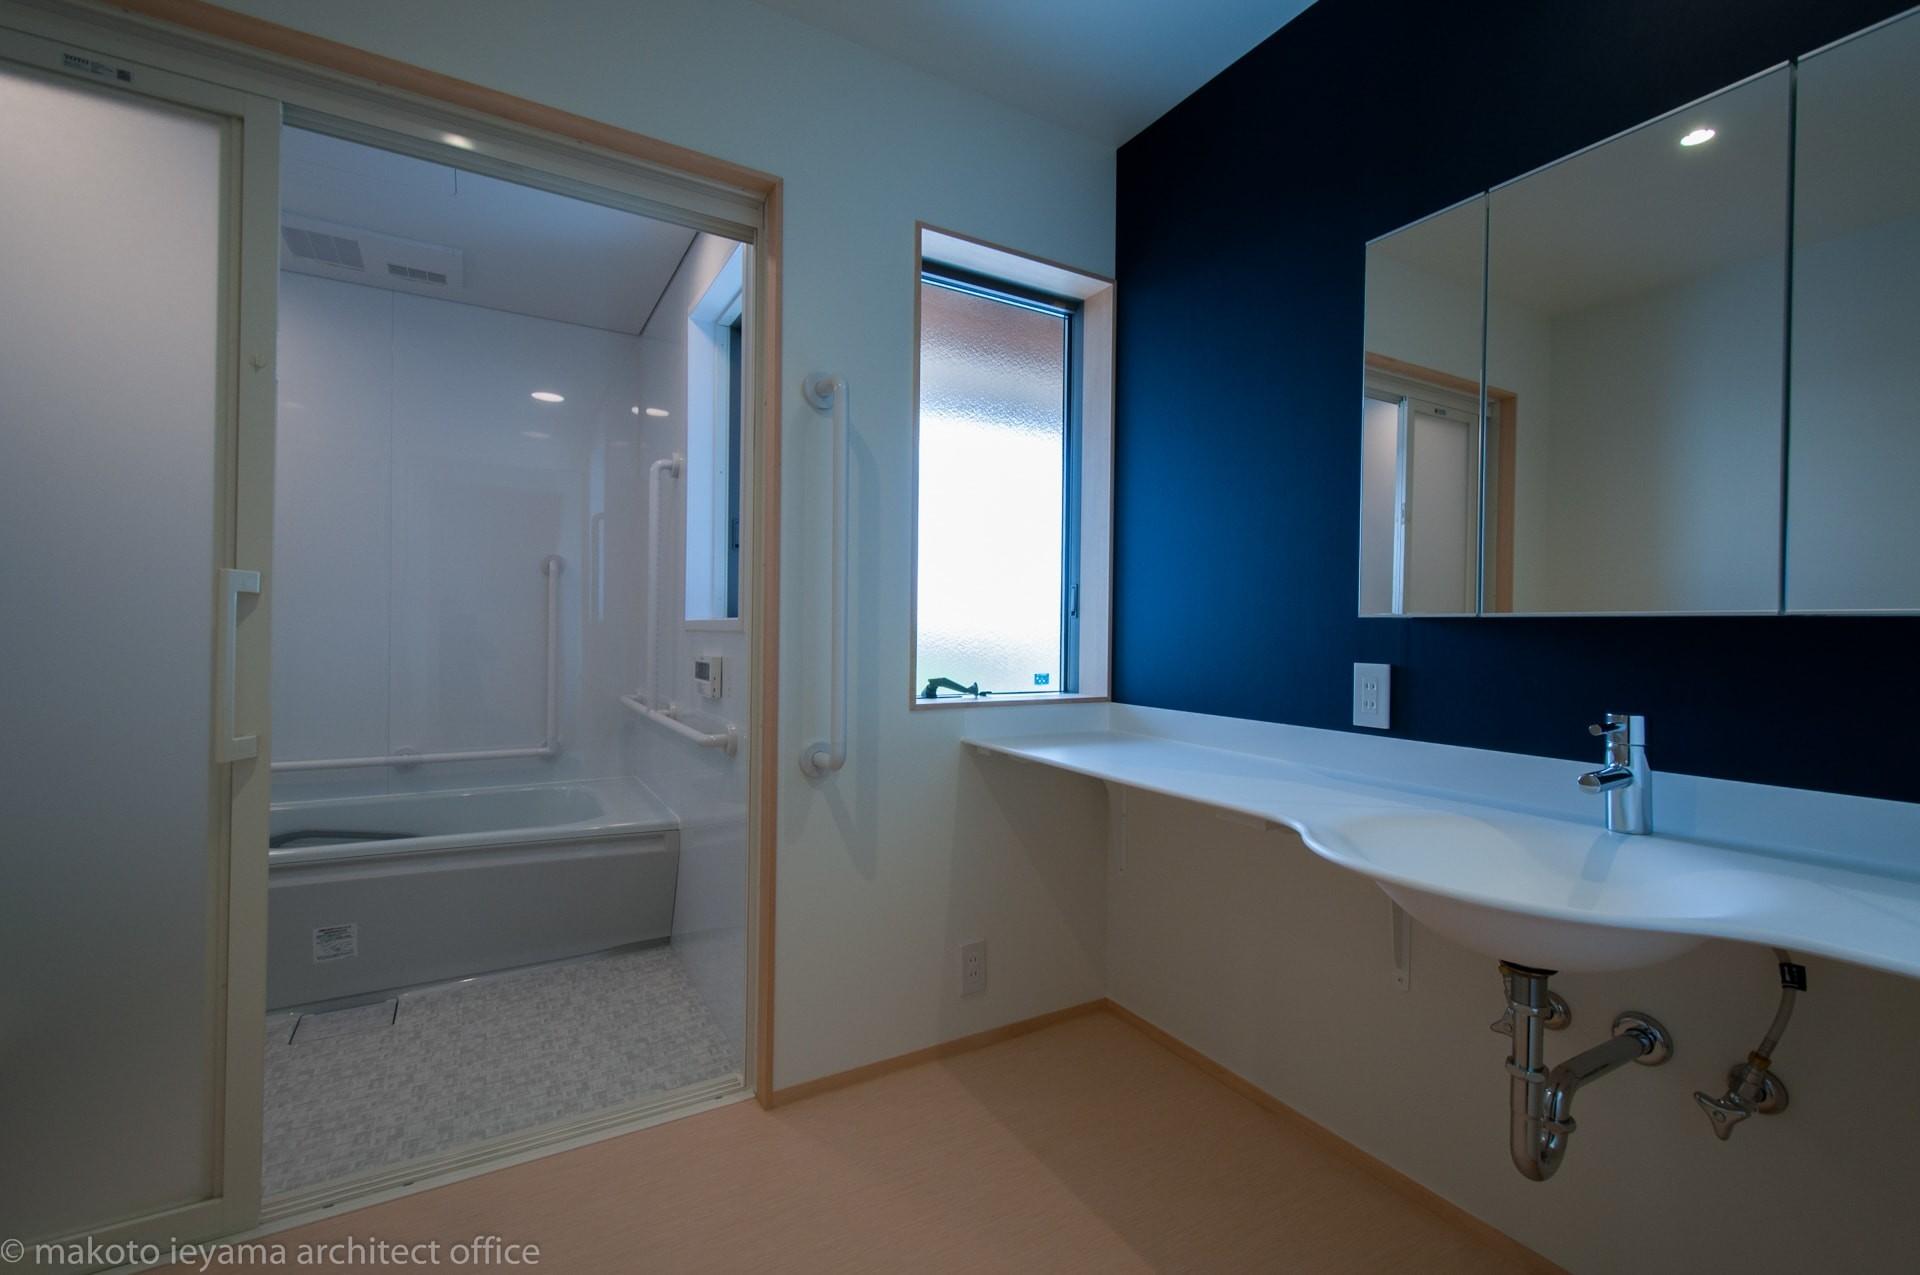 南砺市の家 洗面所